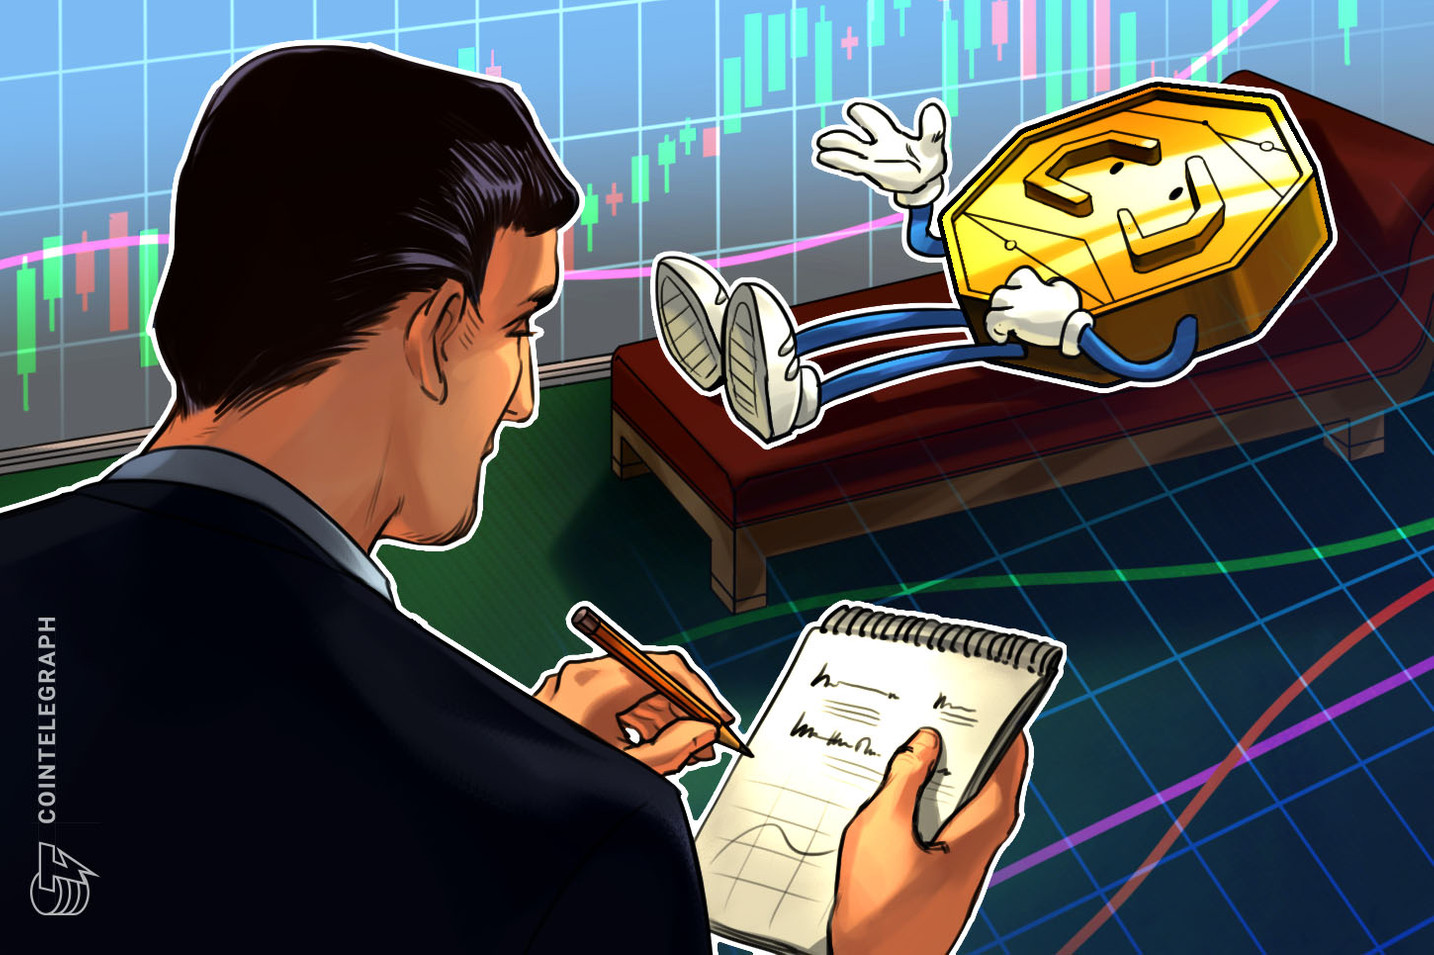 Bitkoin se približio ceni od 5.300 dolara dok američke akcije beleže rast